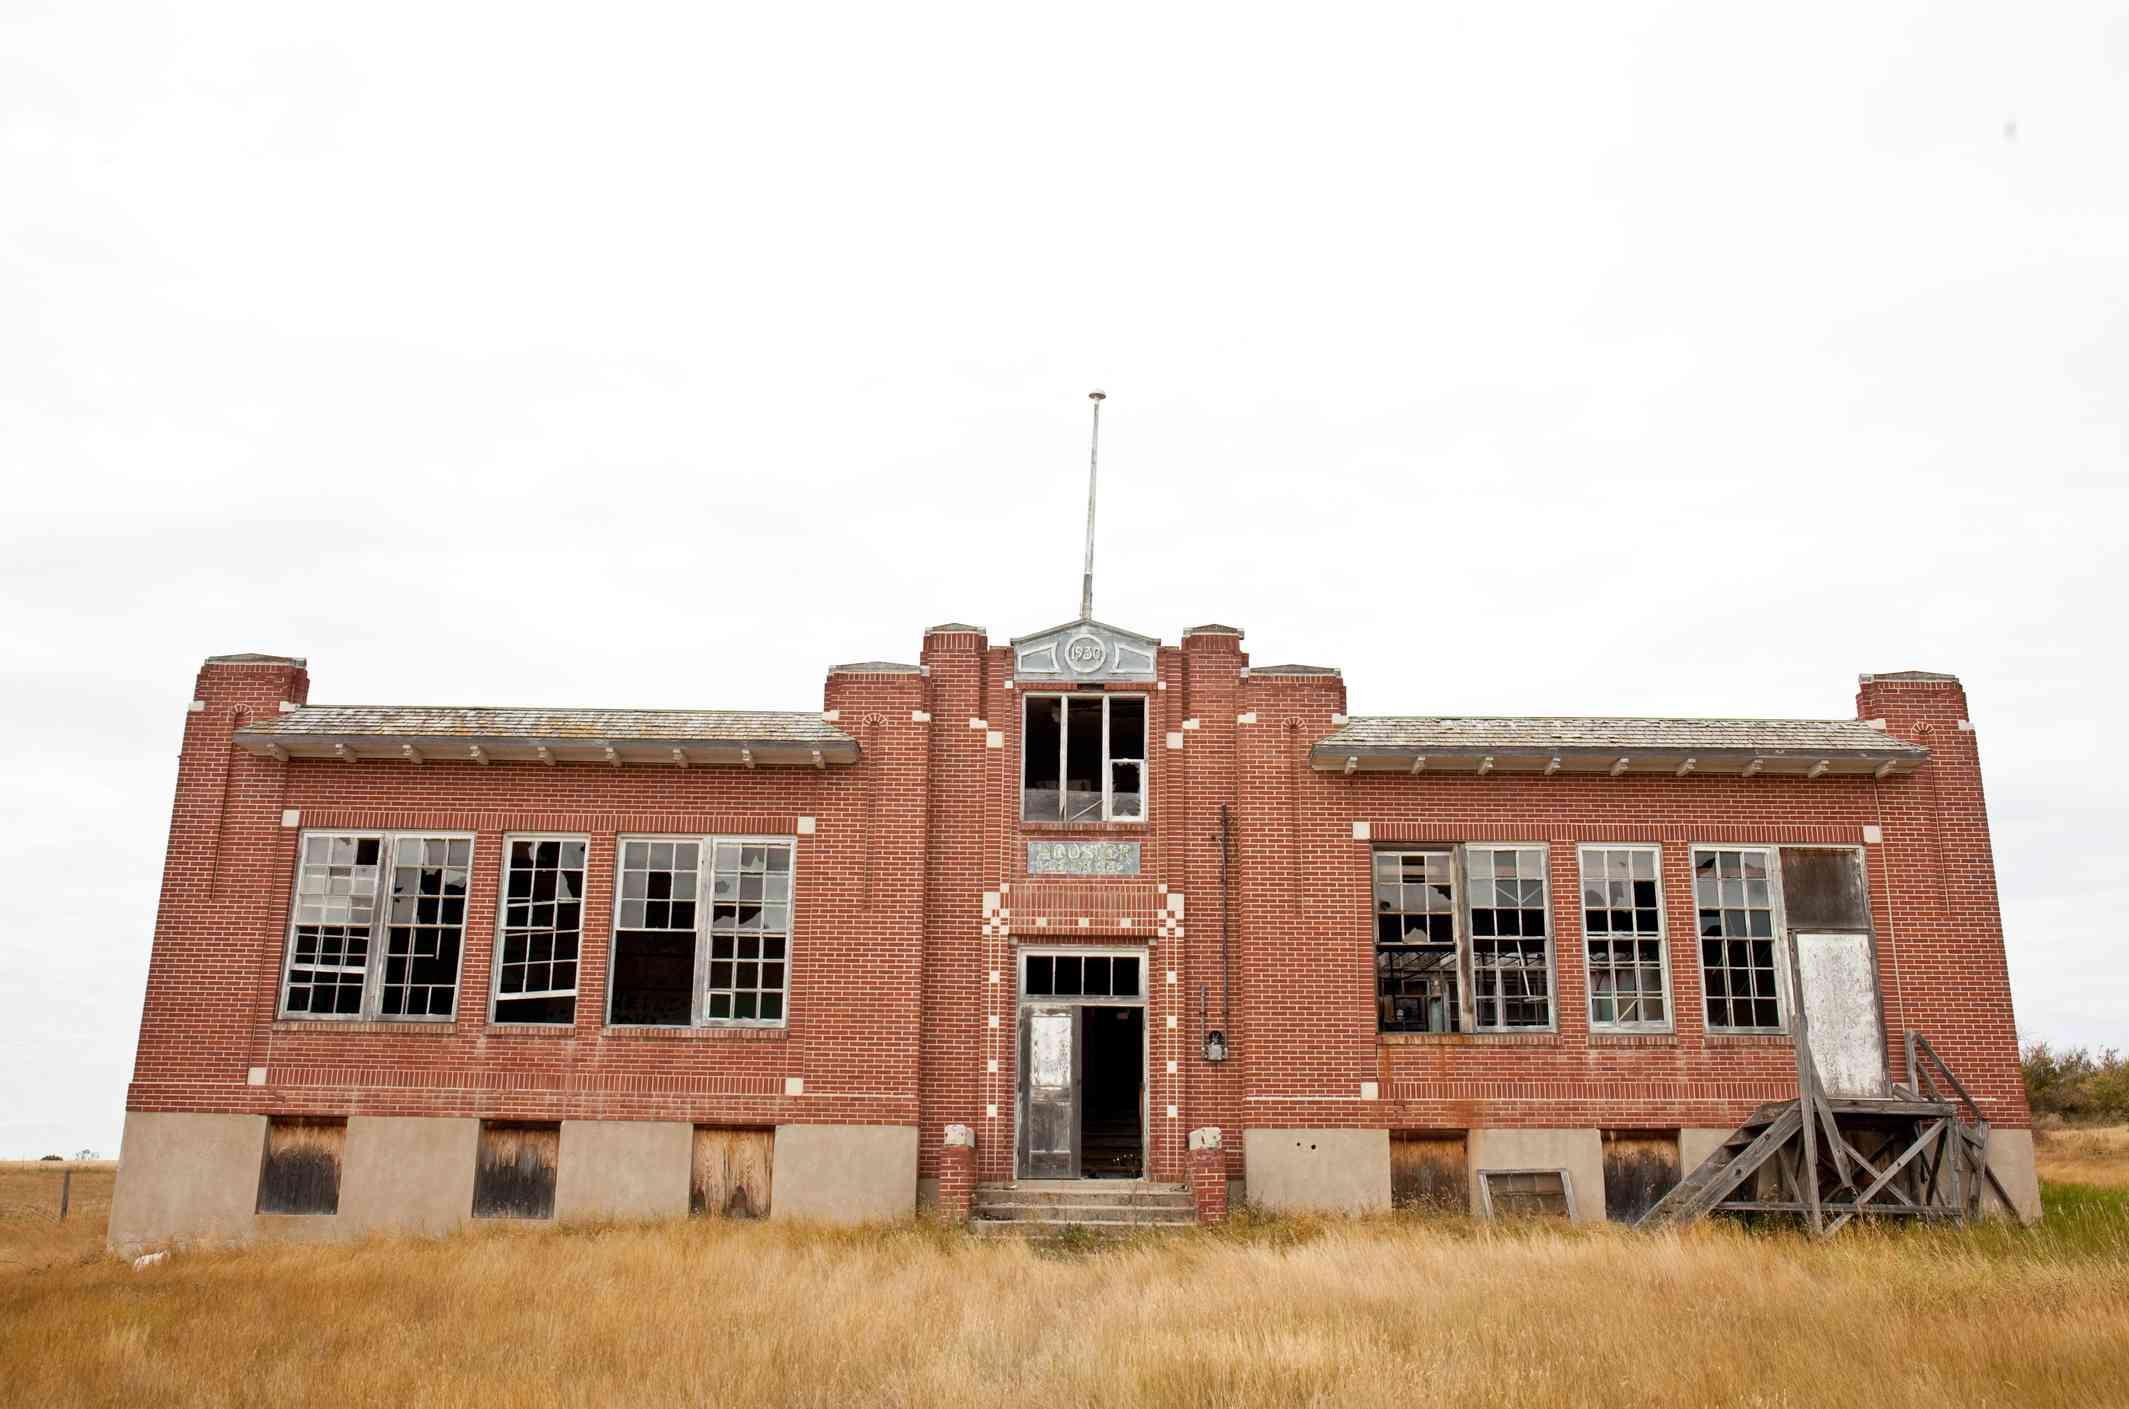 An old abandoned residential school in rural Saskatchewan, Canada.